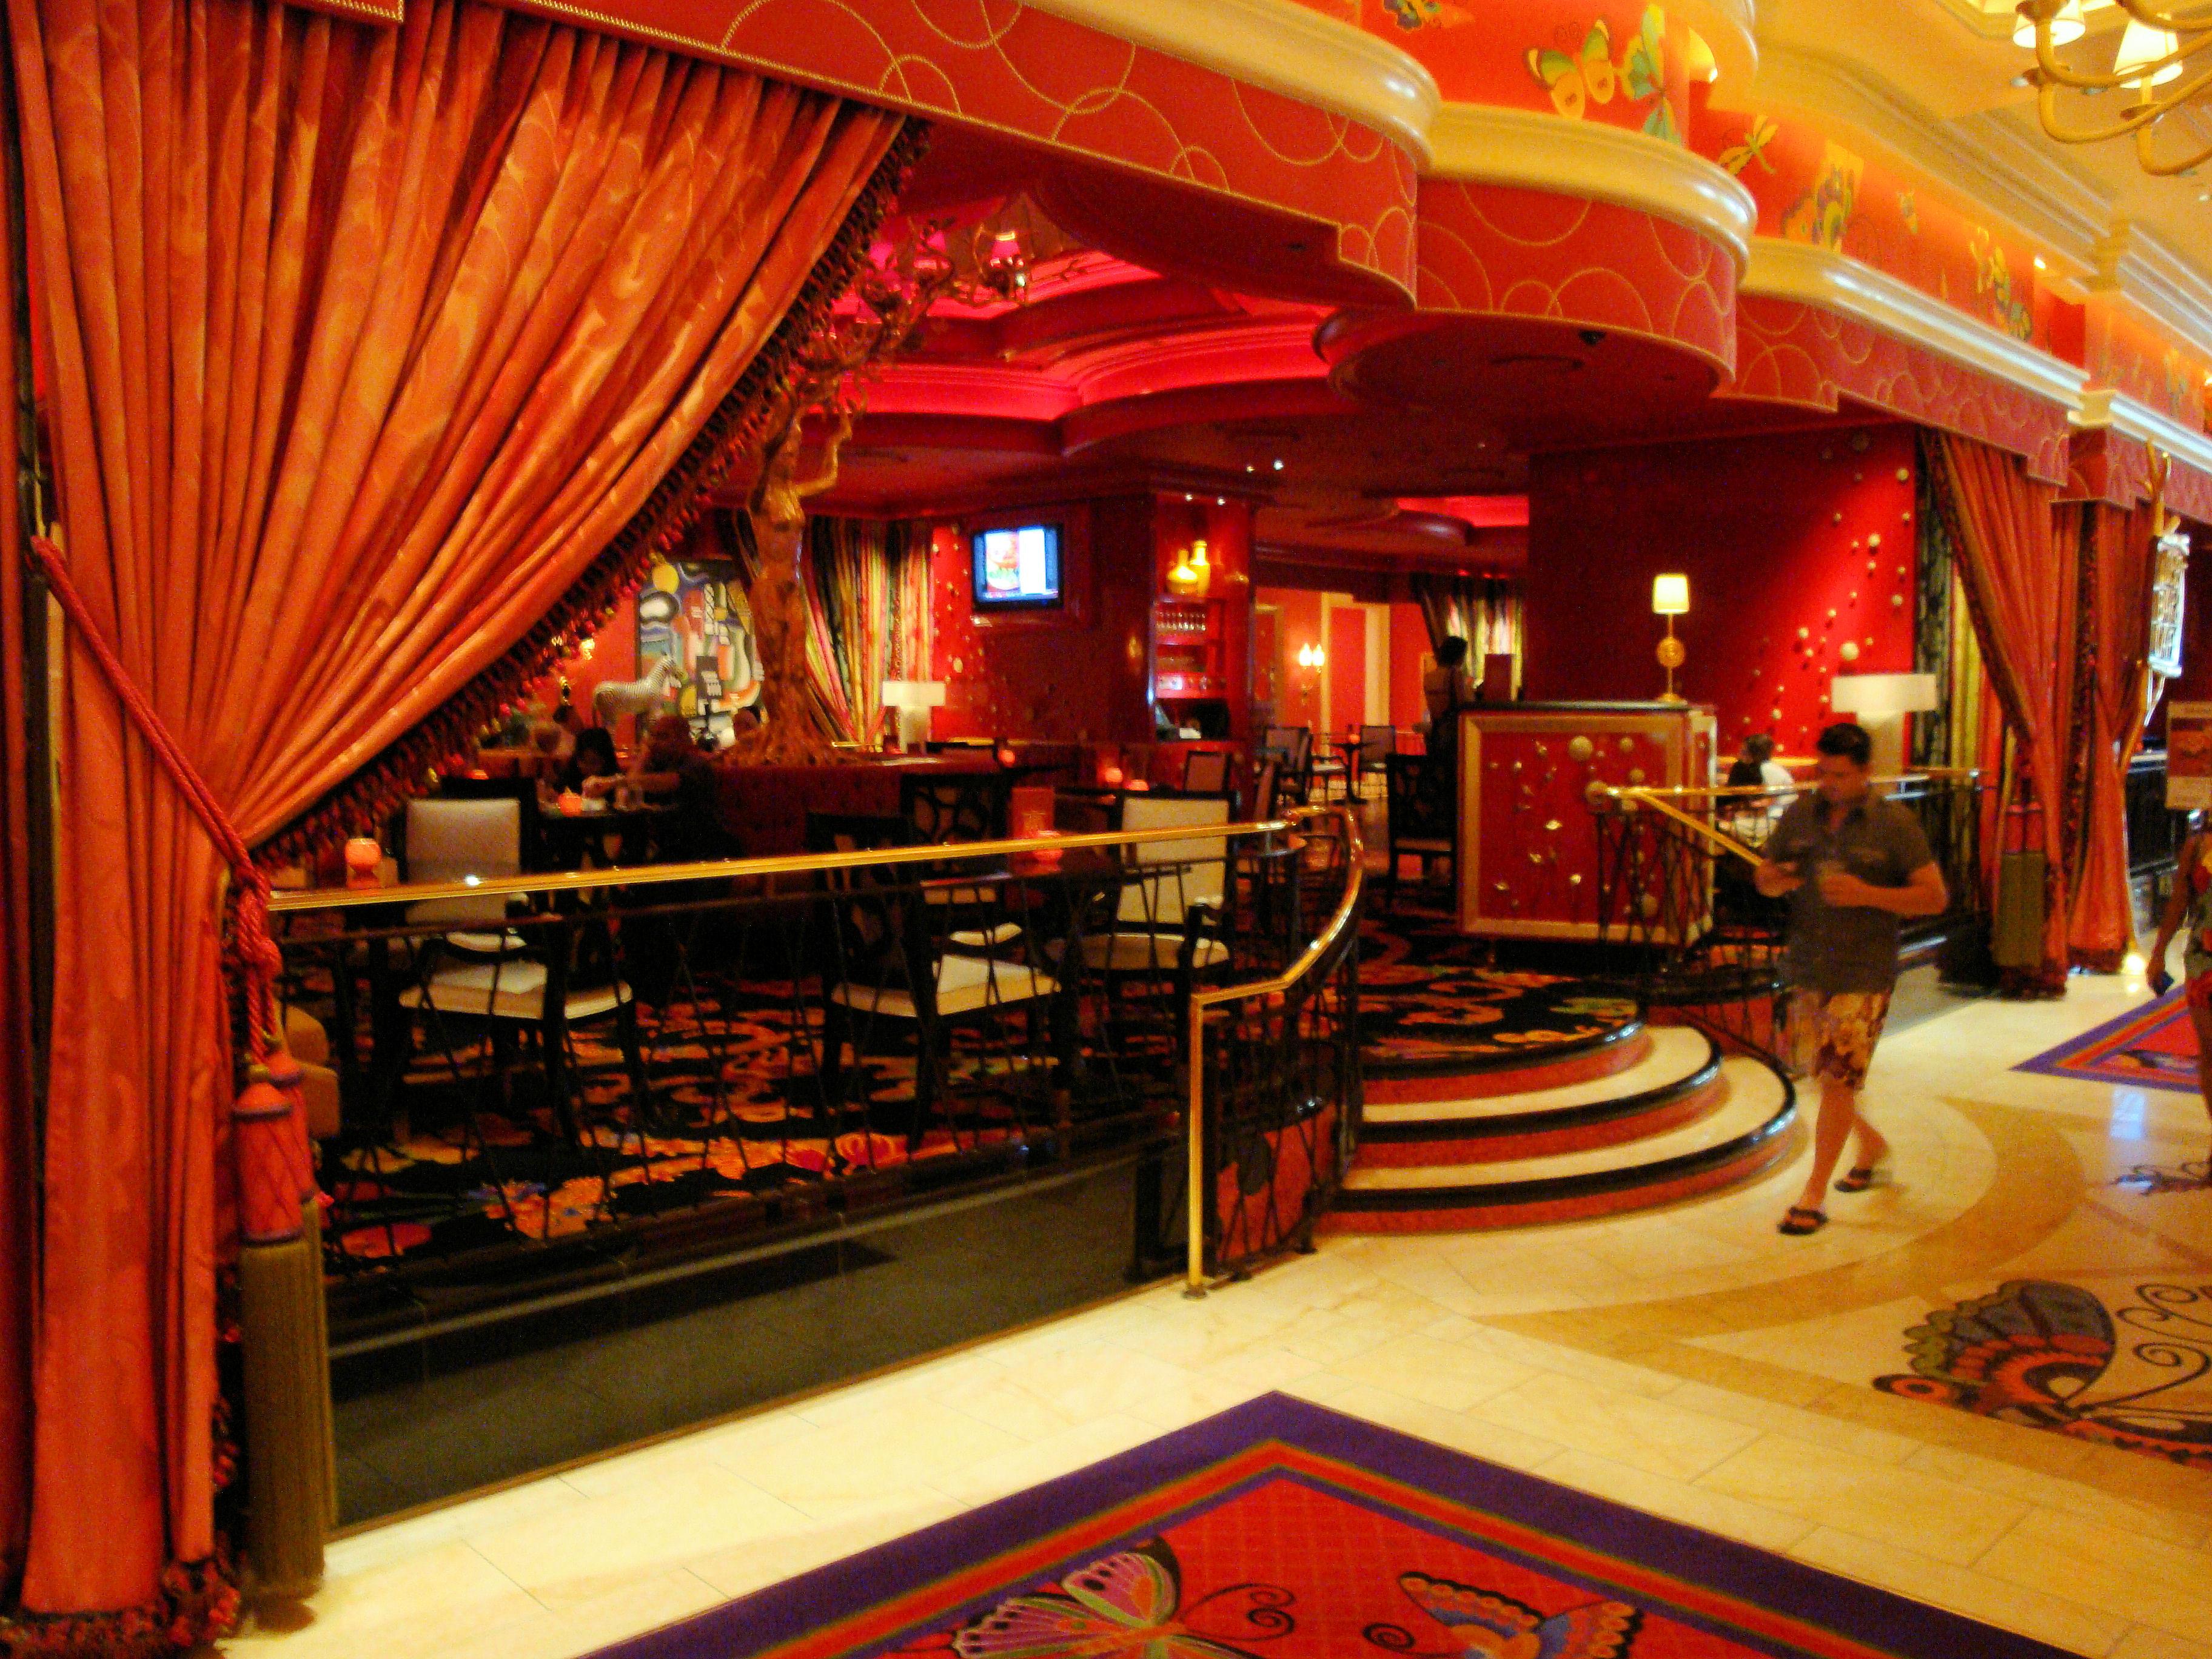 FileDSC32264 The Encore Hotel Las Vegas Nevada USA